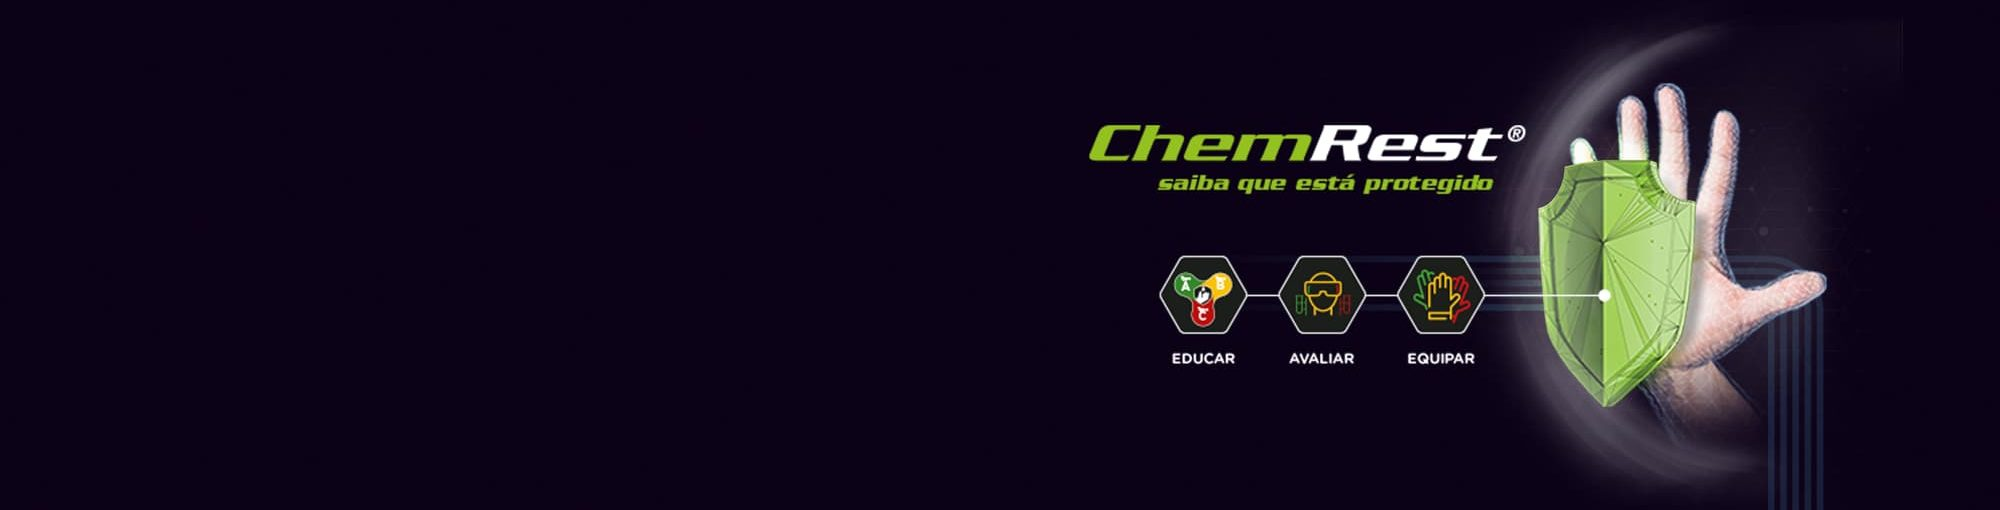 Showa_Chemrest_banner_homepage_v1.0_POR